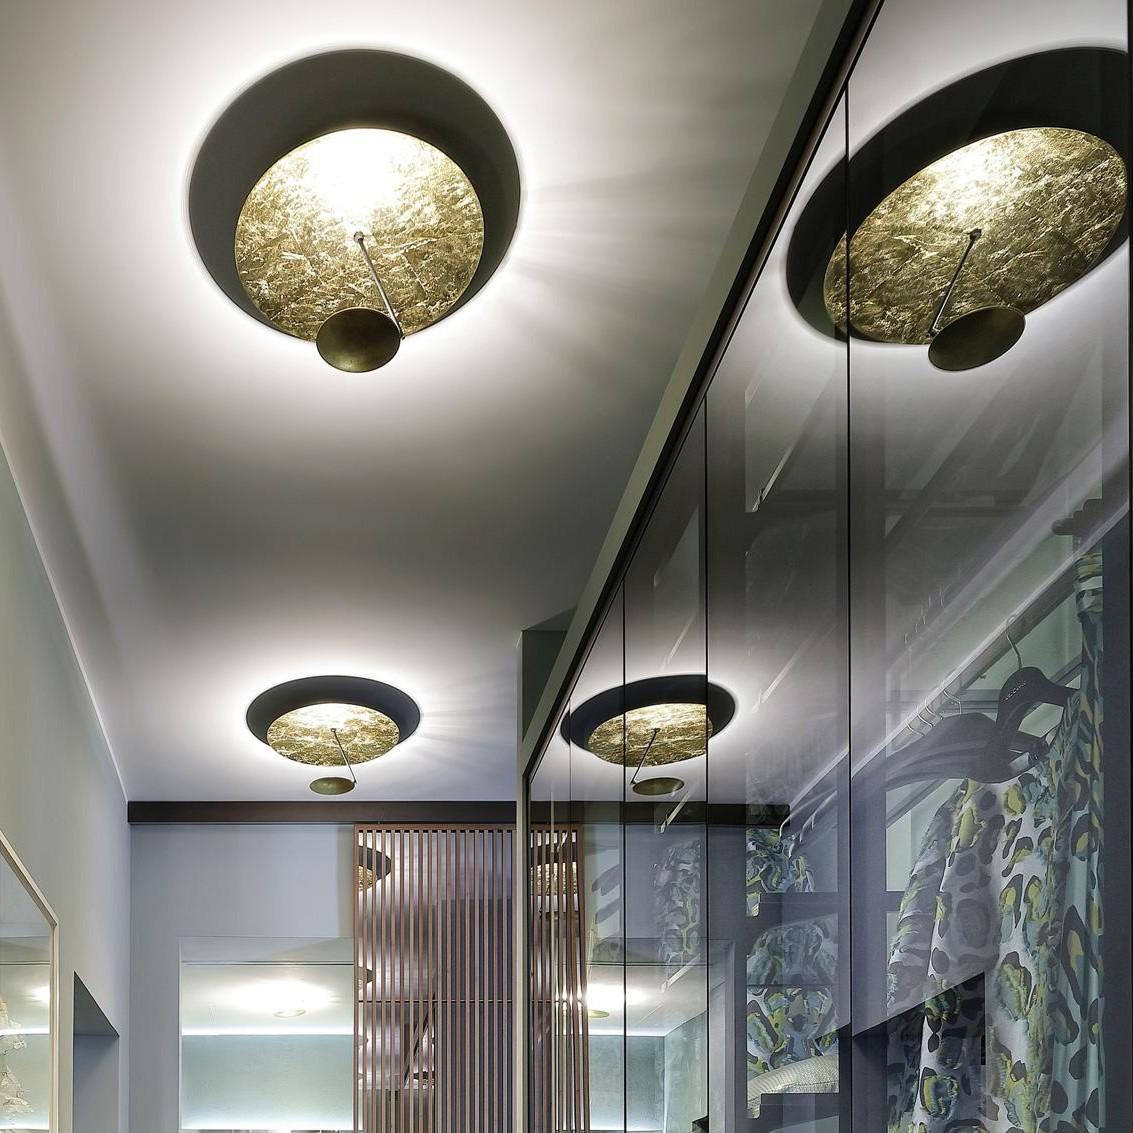 Catellani & Smith Lederam C150 LED Deckenleuchte | AmbienteDirect